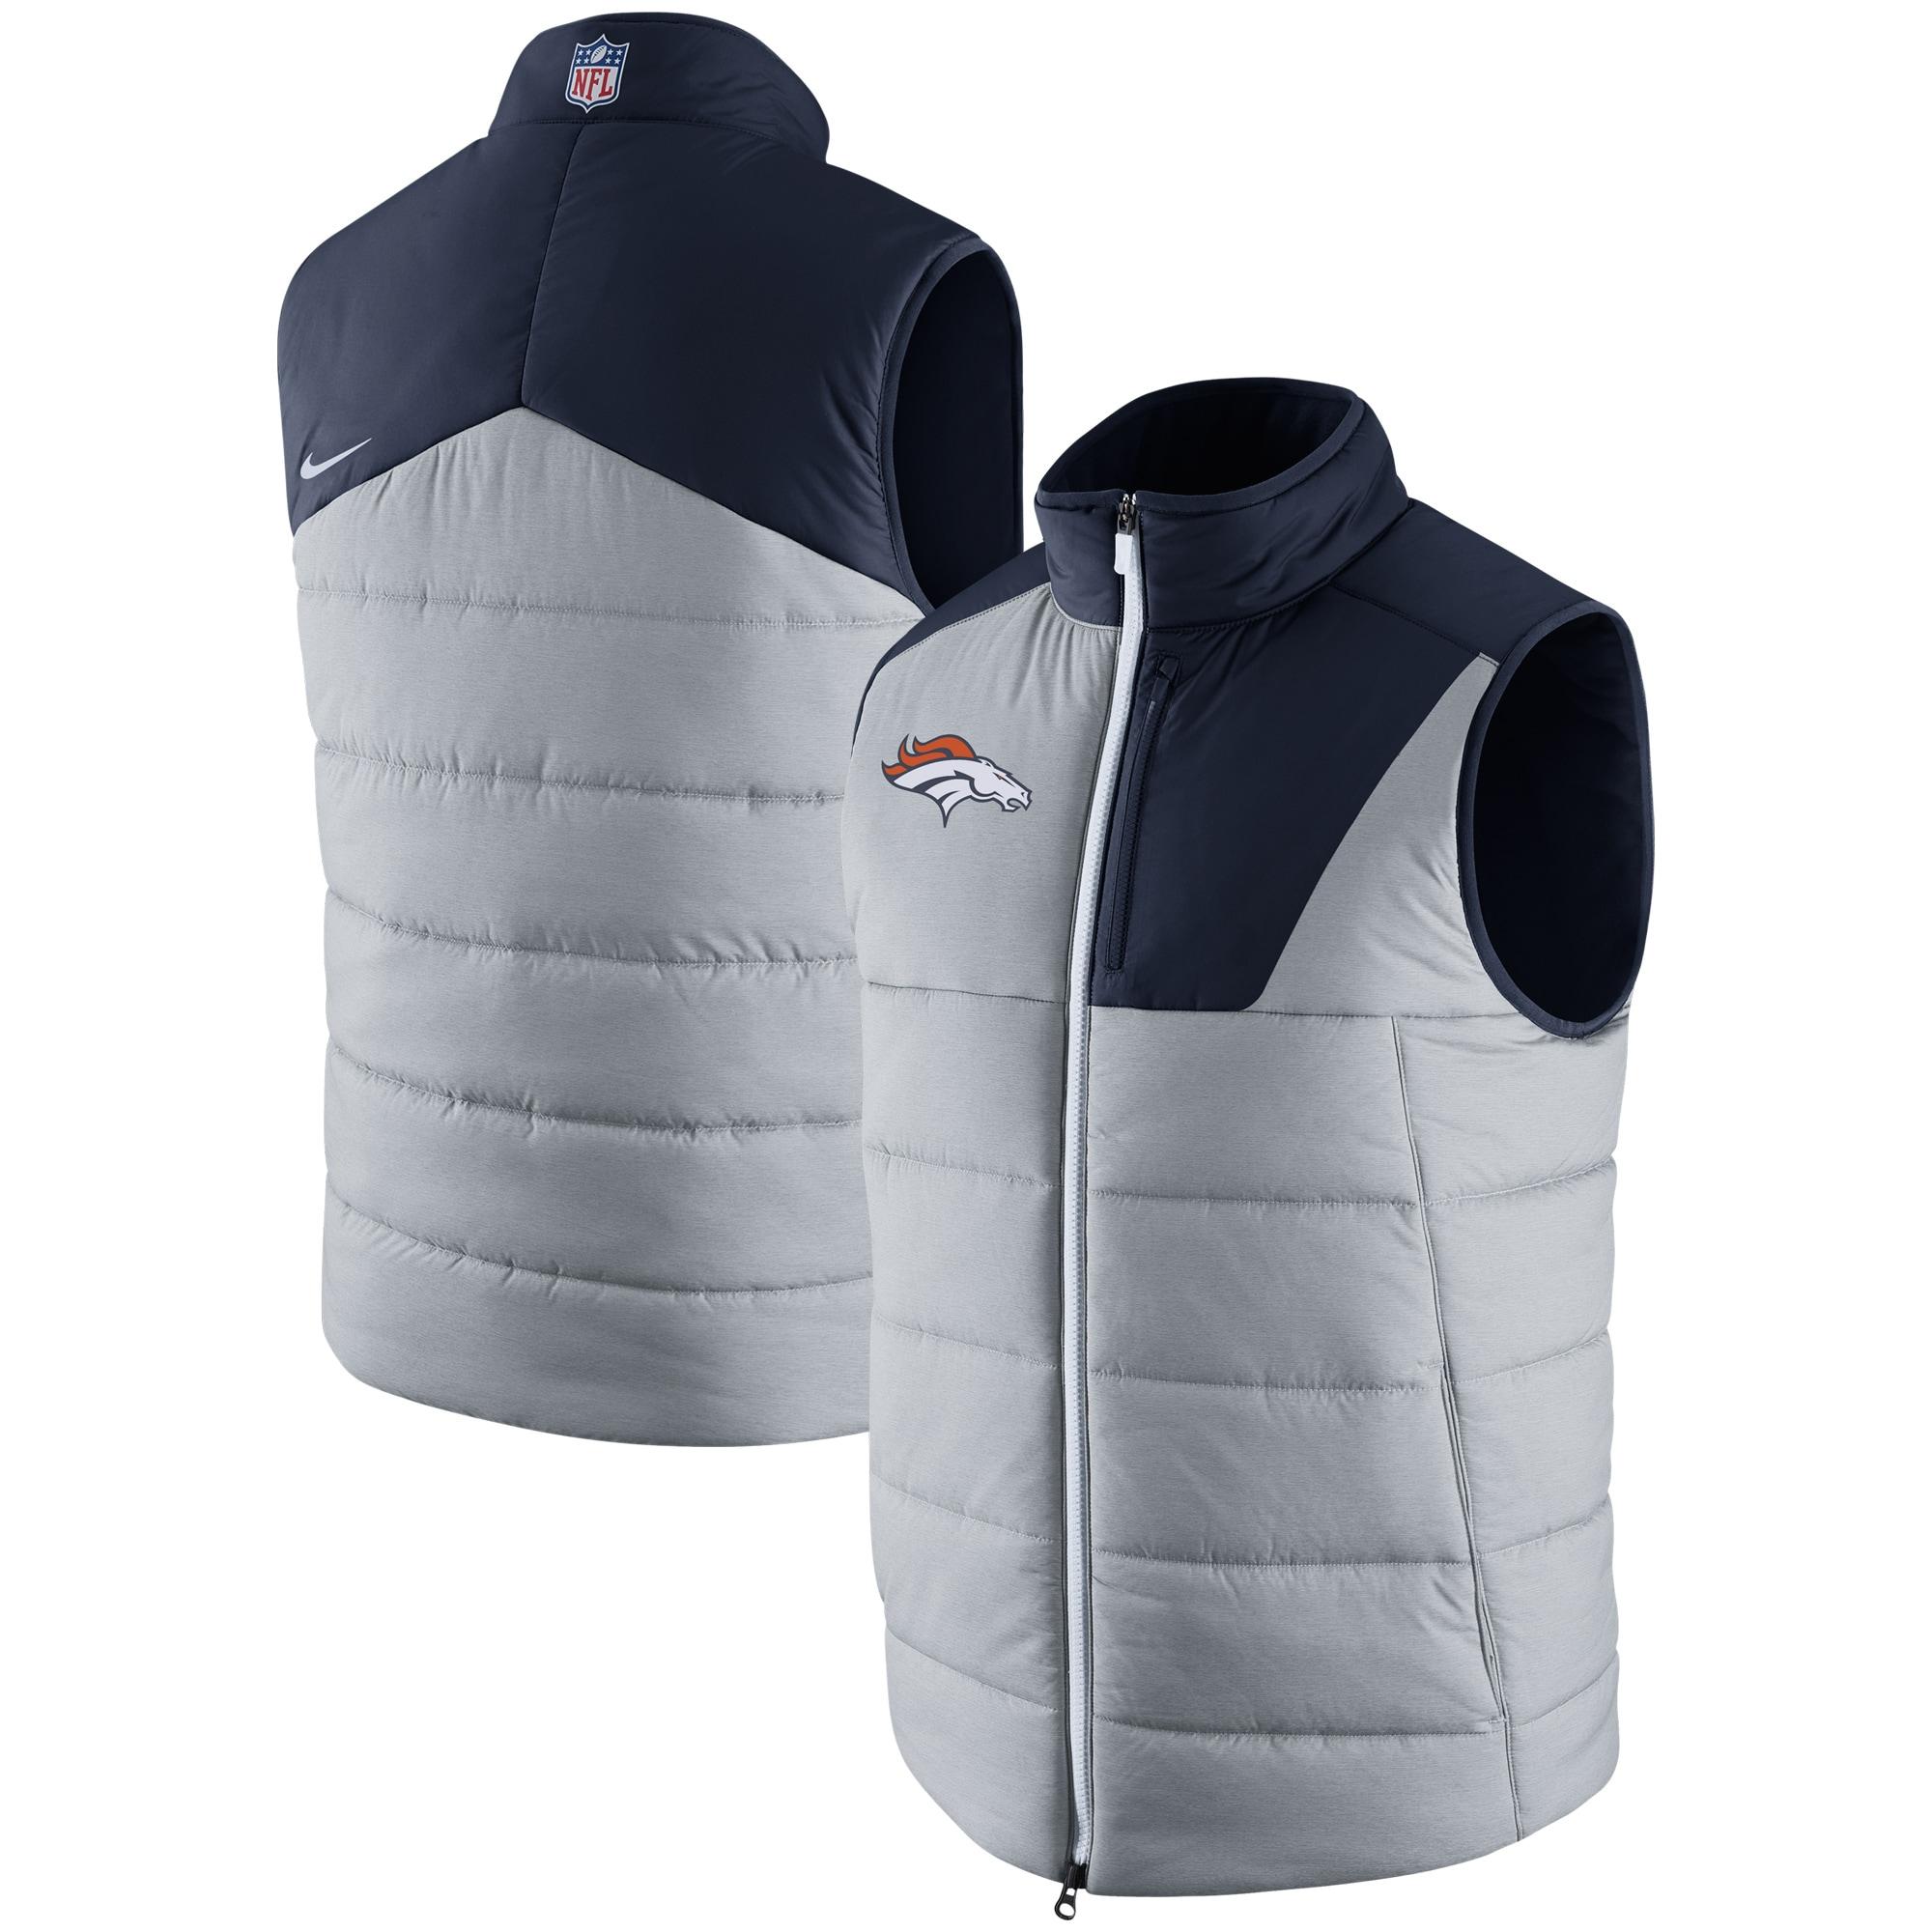 Denver Broncos Nike Champ Drive Vest - Heathered Gray